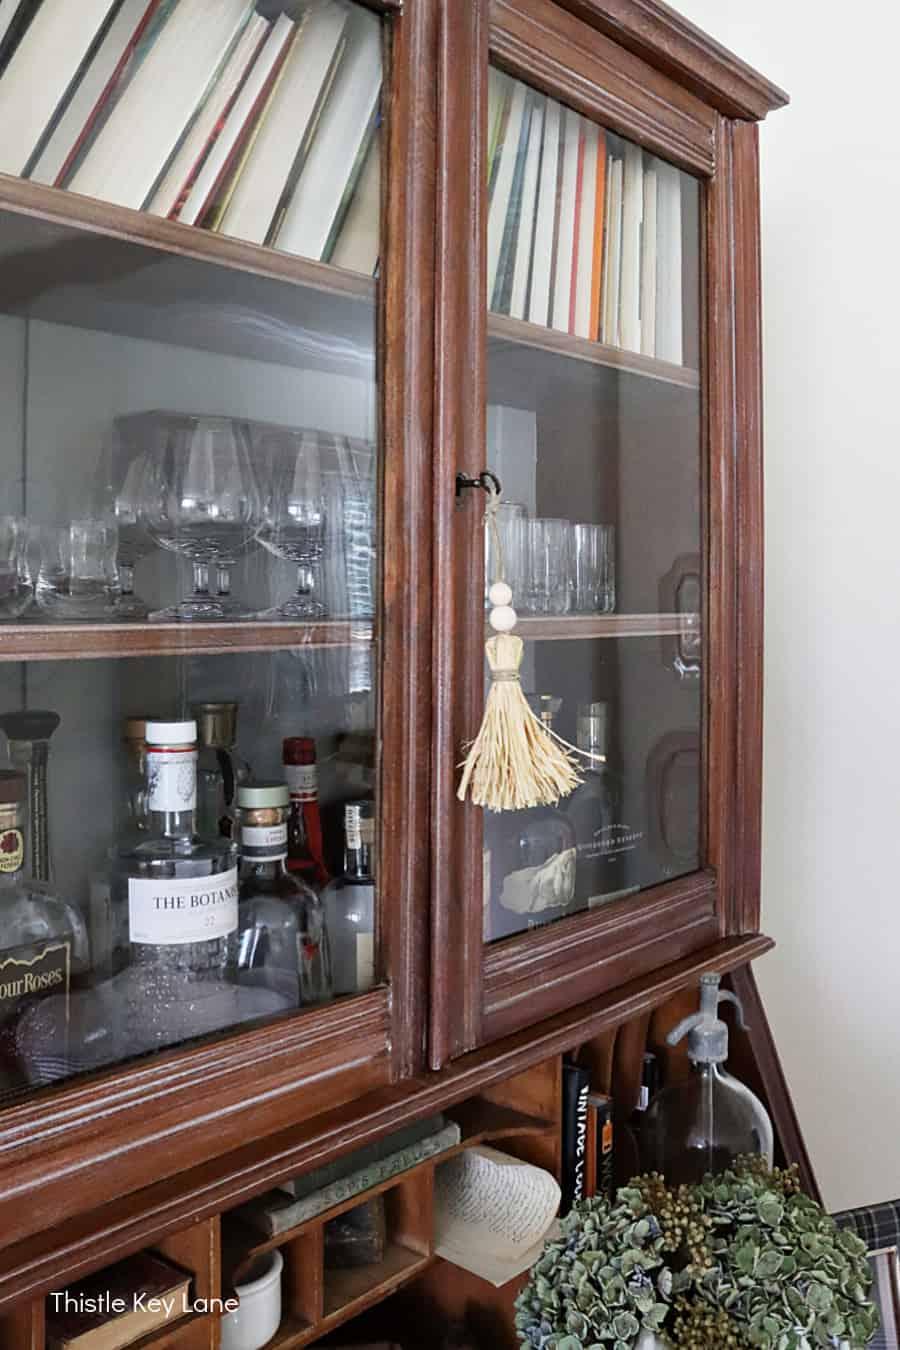 Raffia tassel tied to a key hanging from a cabinet. How To Make Raffia Tassels.